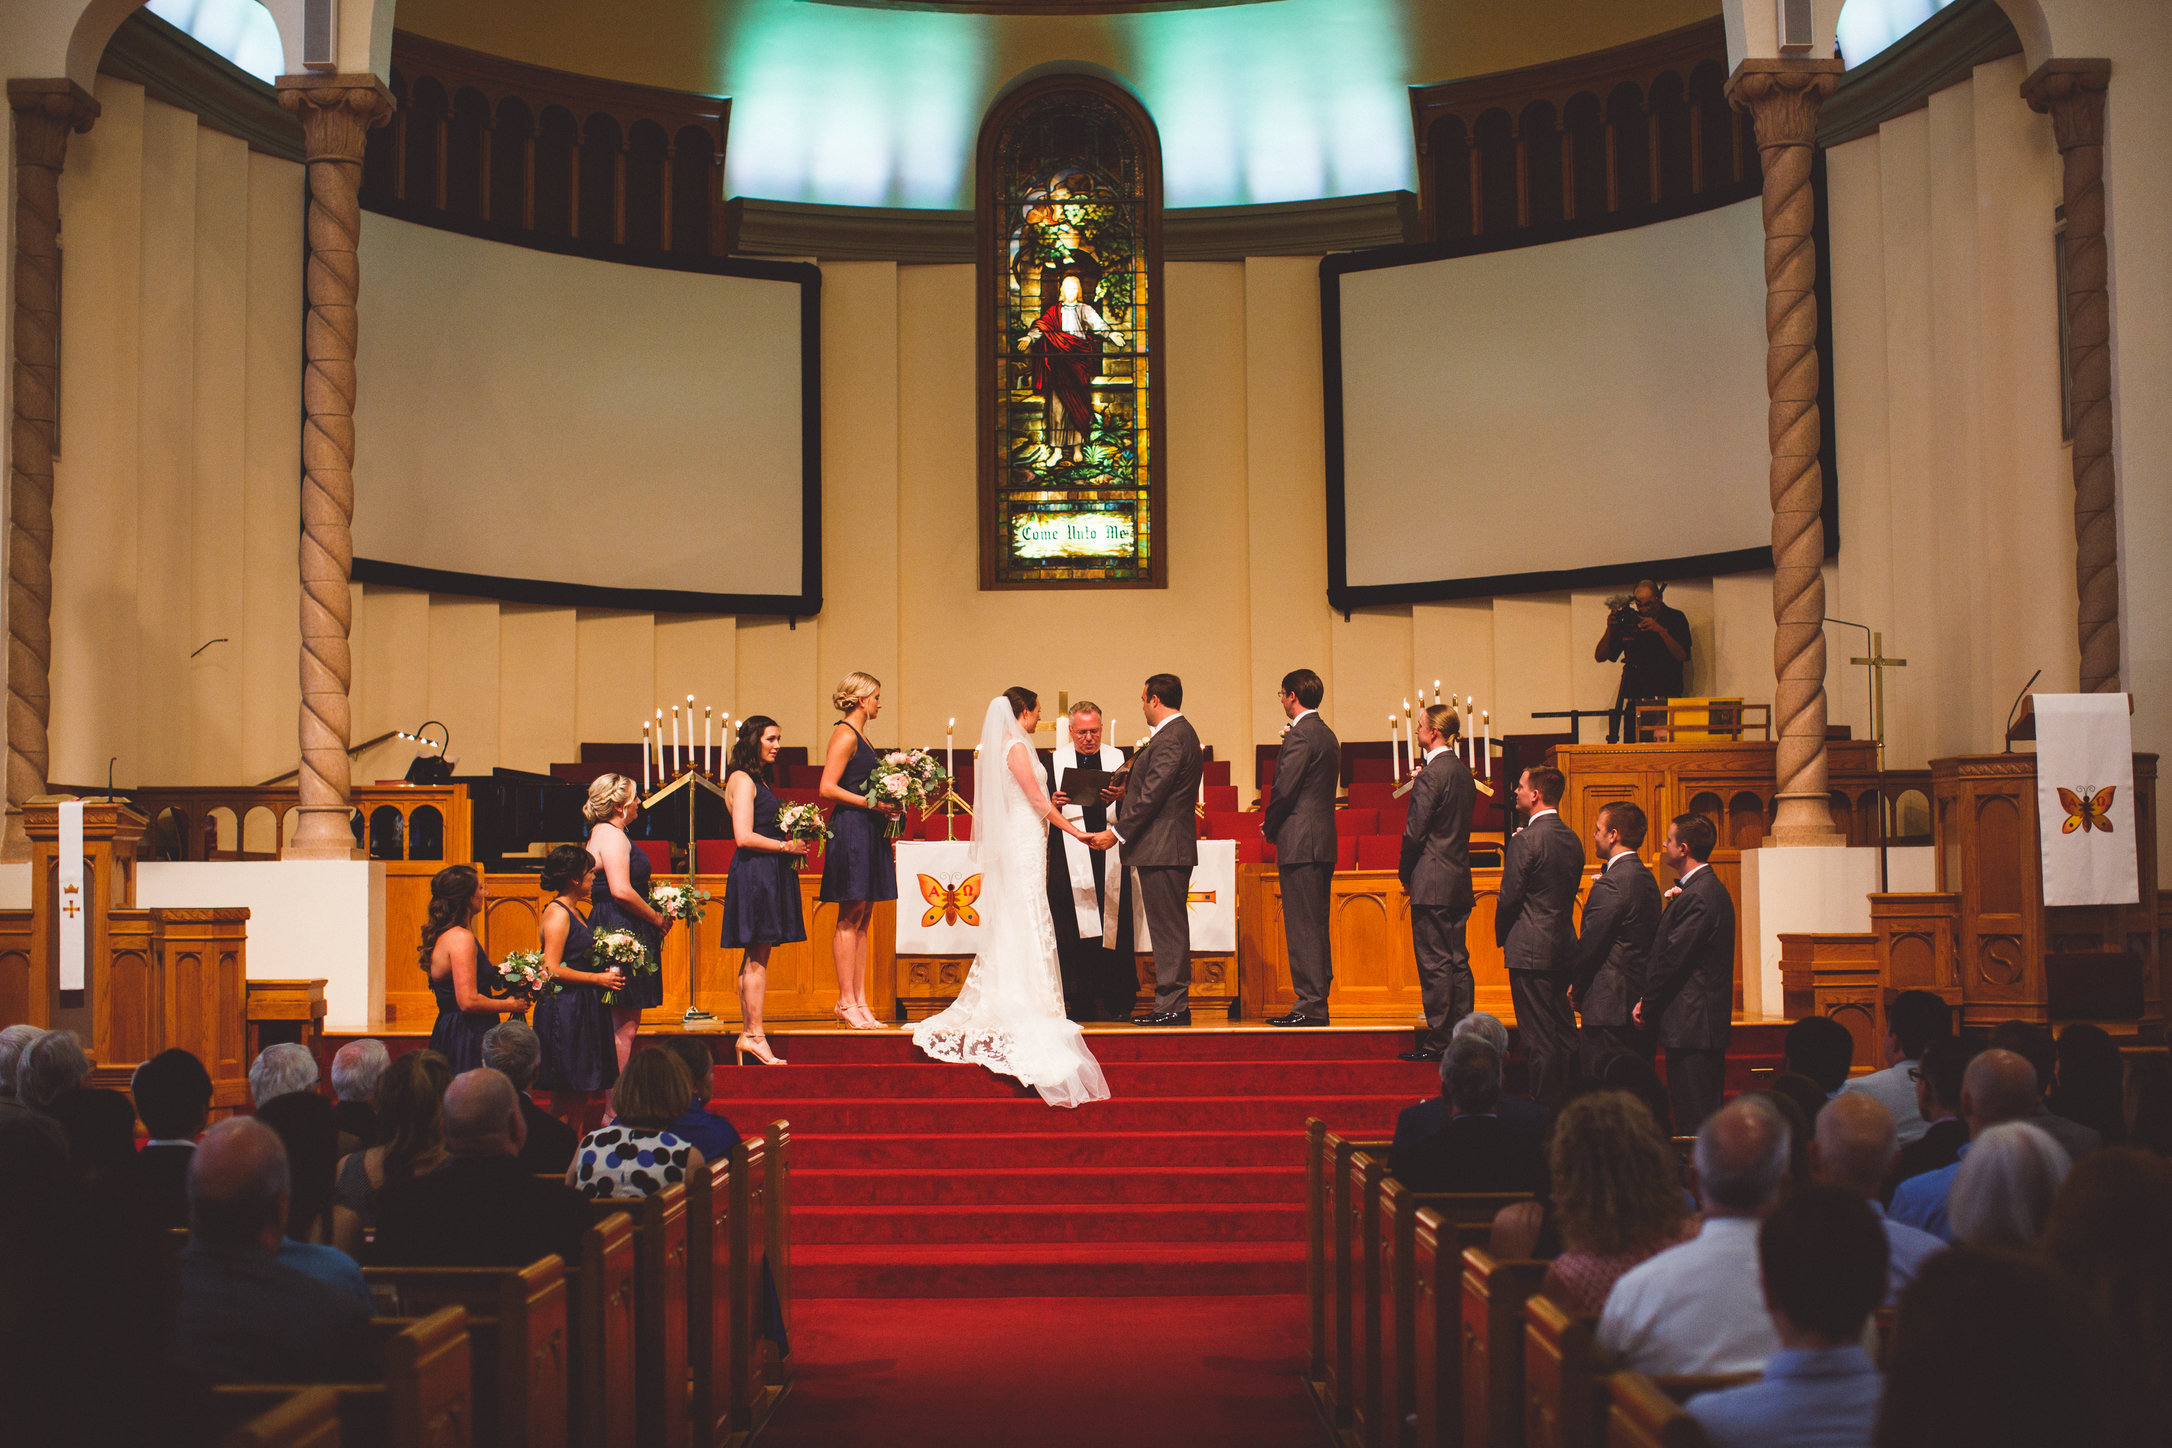 SandC-wedding-178.jpg